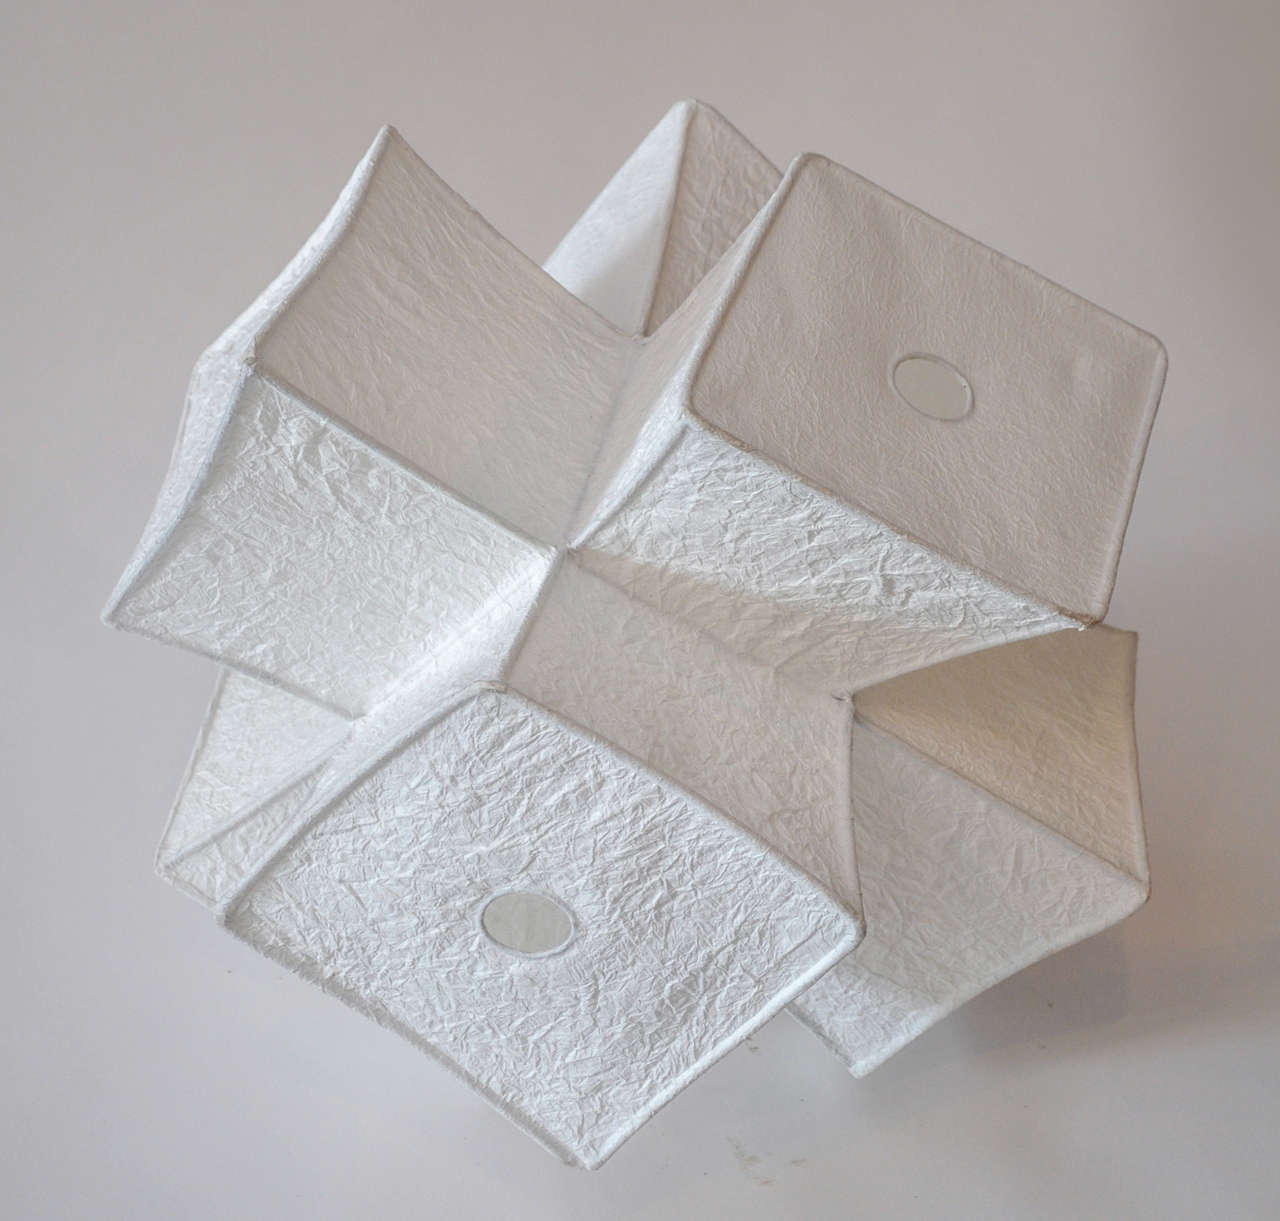 Paper light fixtures oh you crafty gal diy paper light pendant mundane entertainment oh snap - Paper light fixtures ...